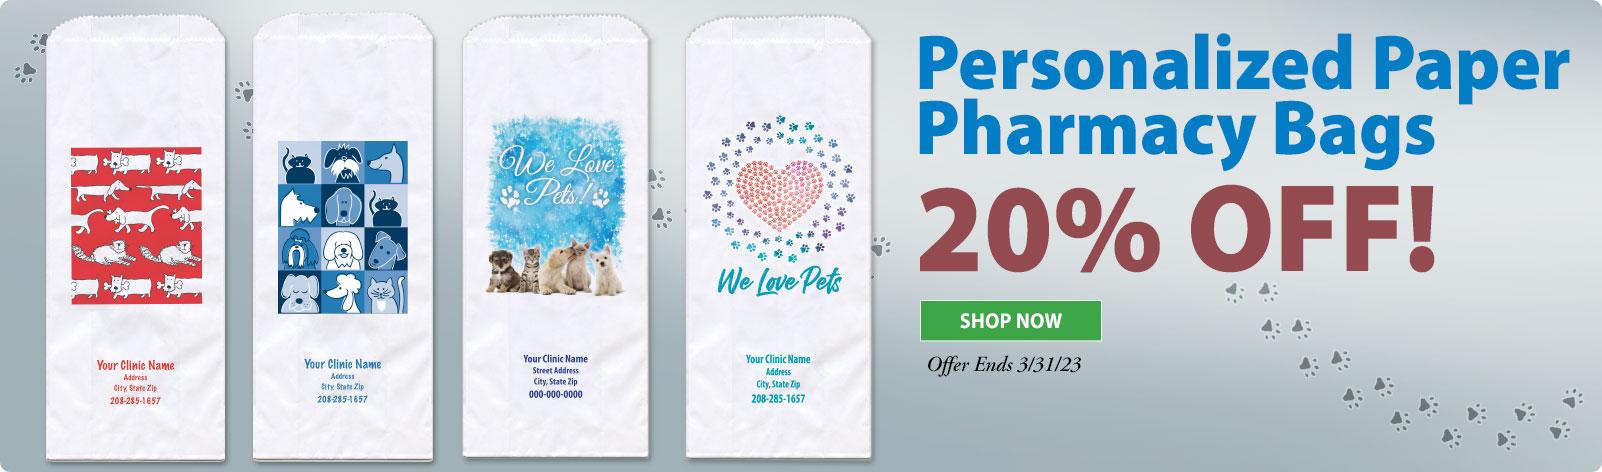 20% Off Veterinary Pharmacy Bags!